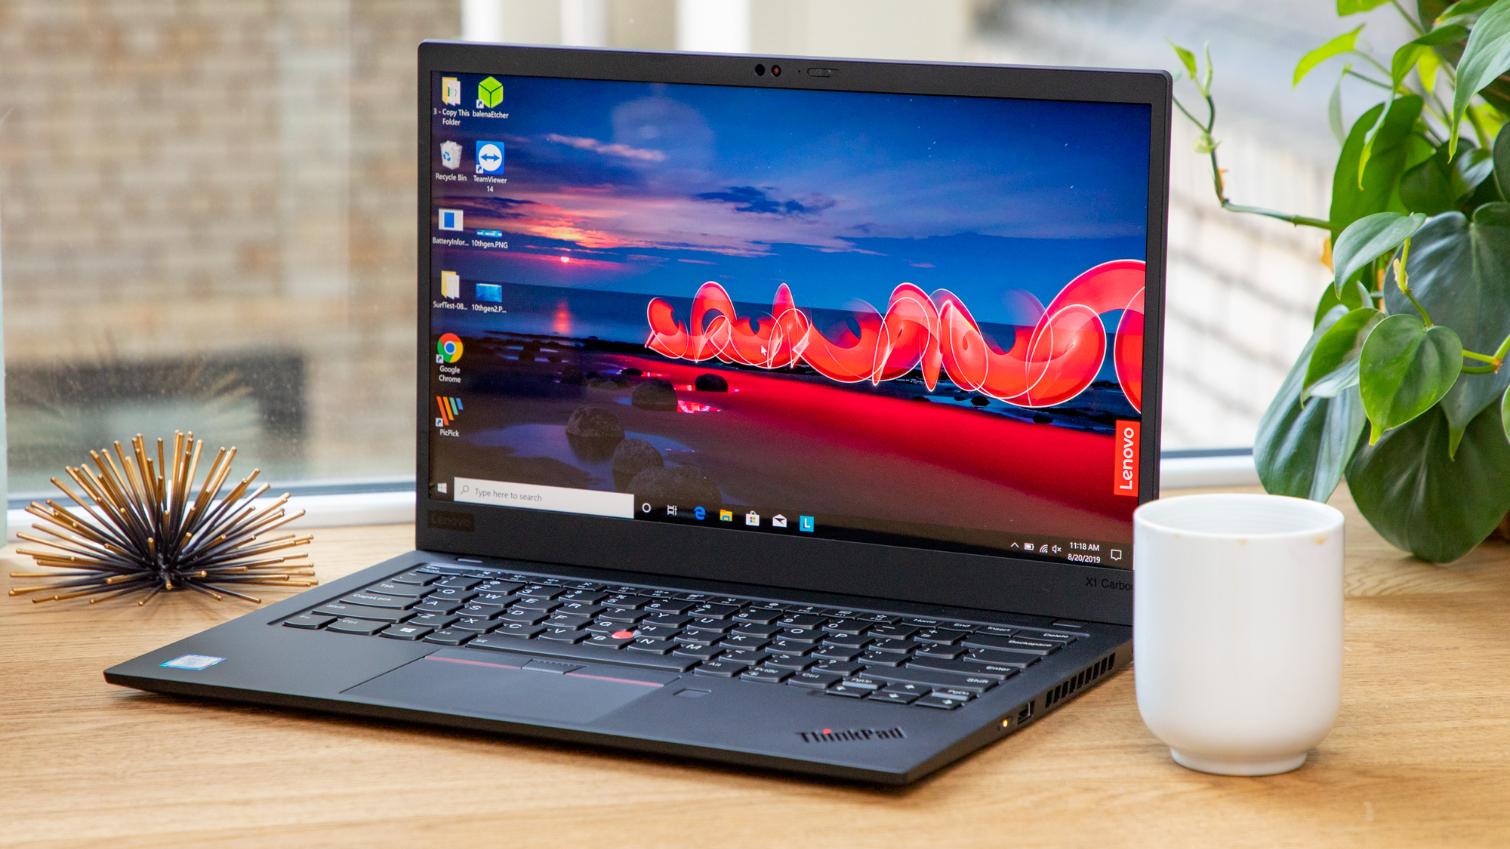 Lenovo ThinkPad X1 Carbon Gen 7